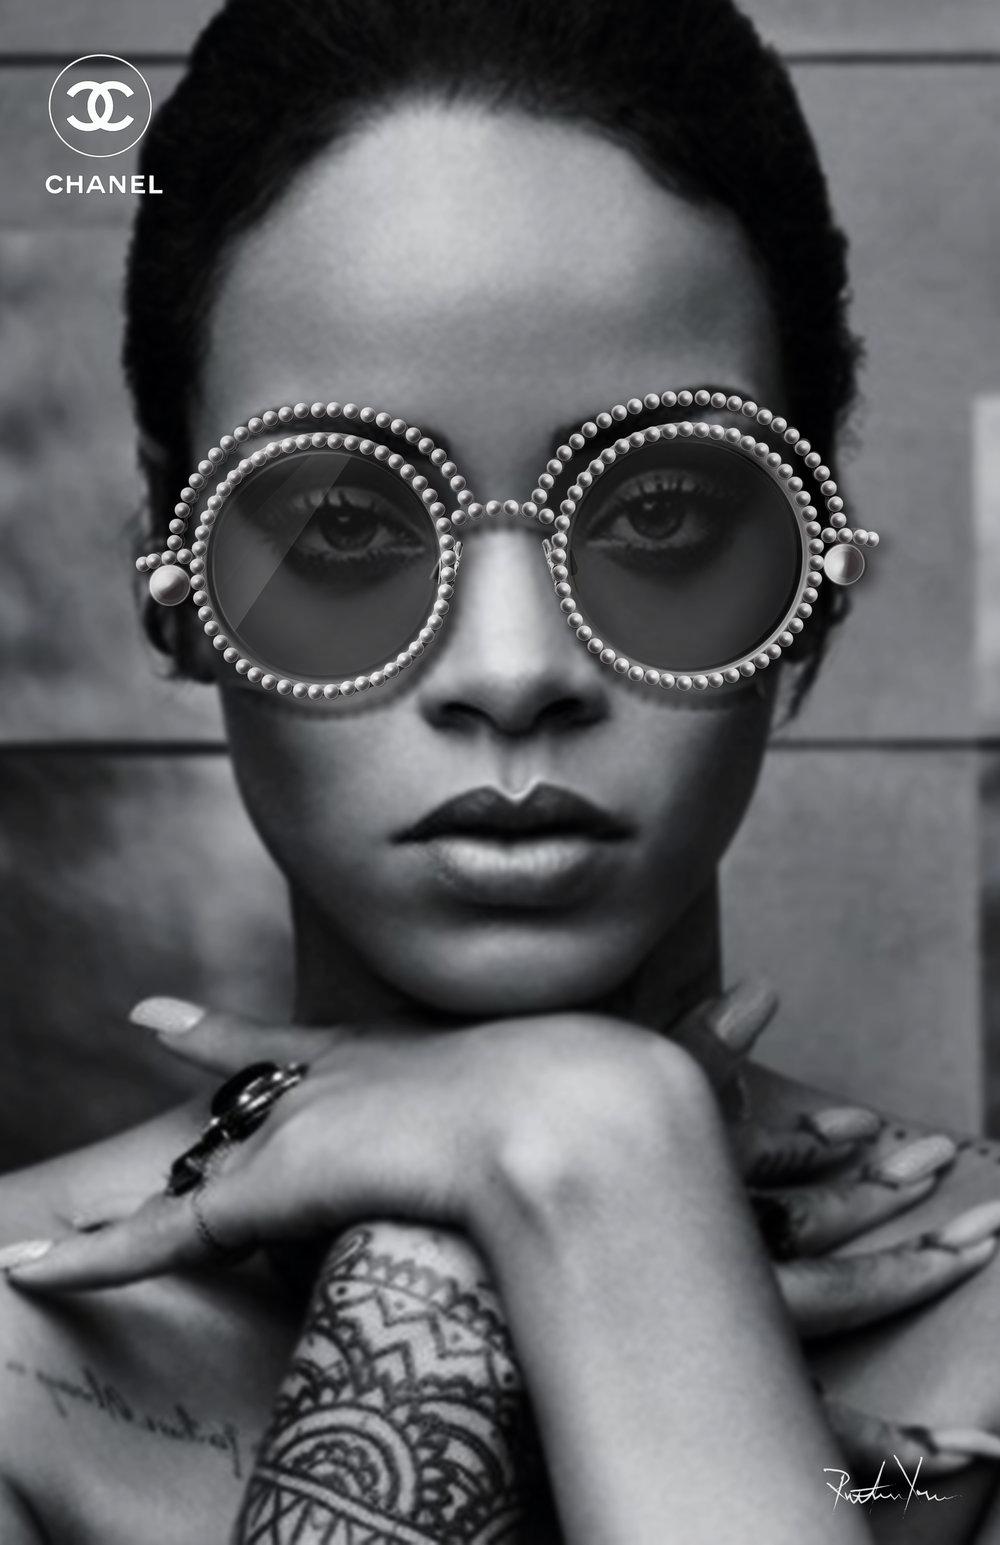 eyewear-chanel.jpg